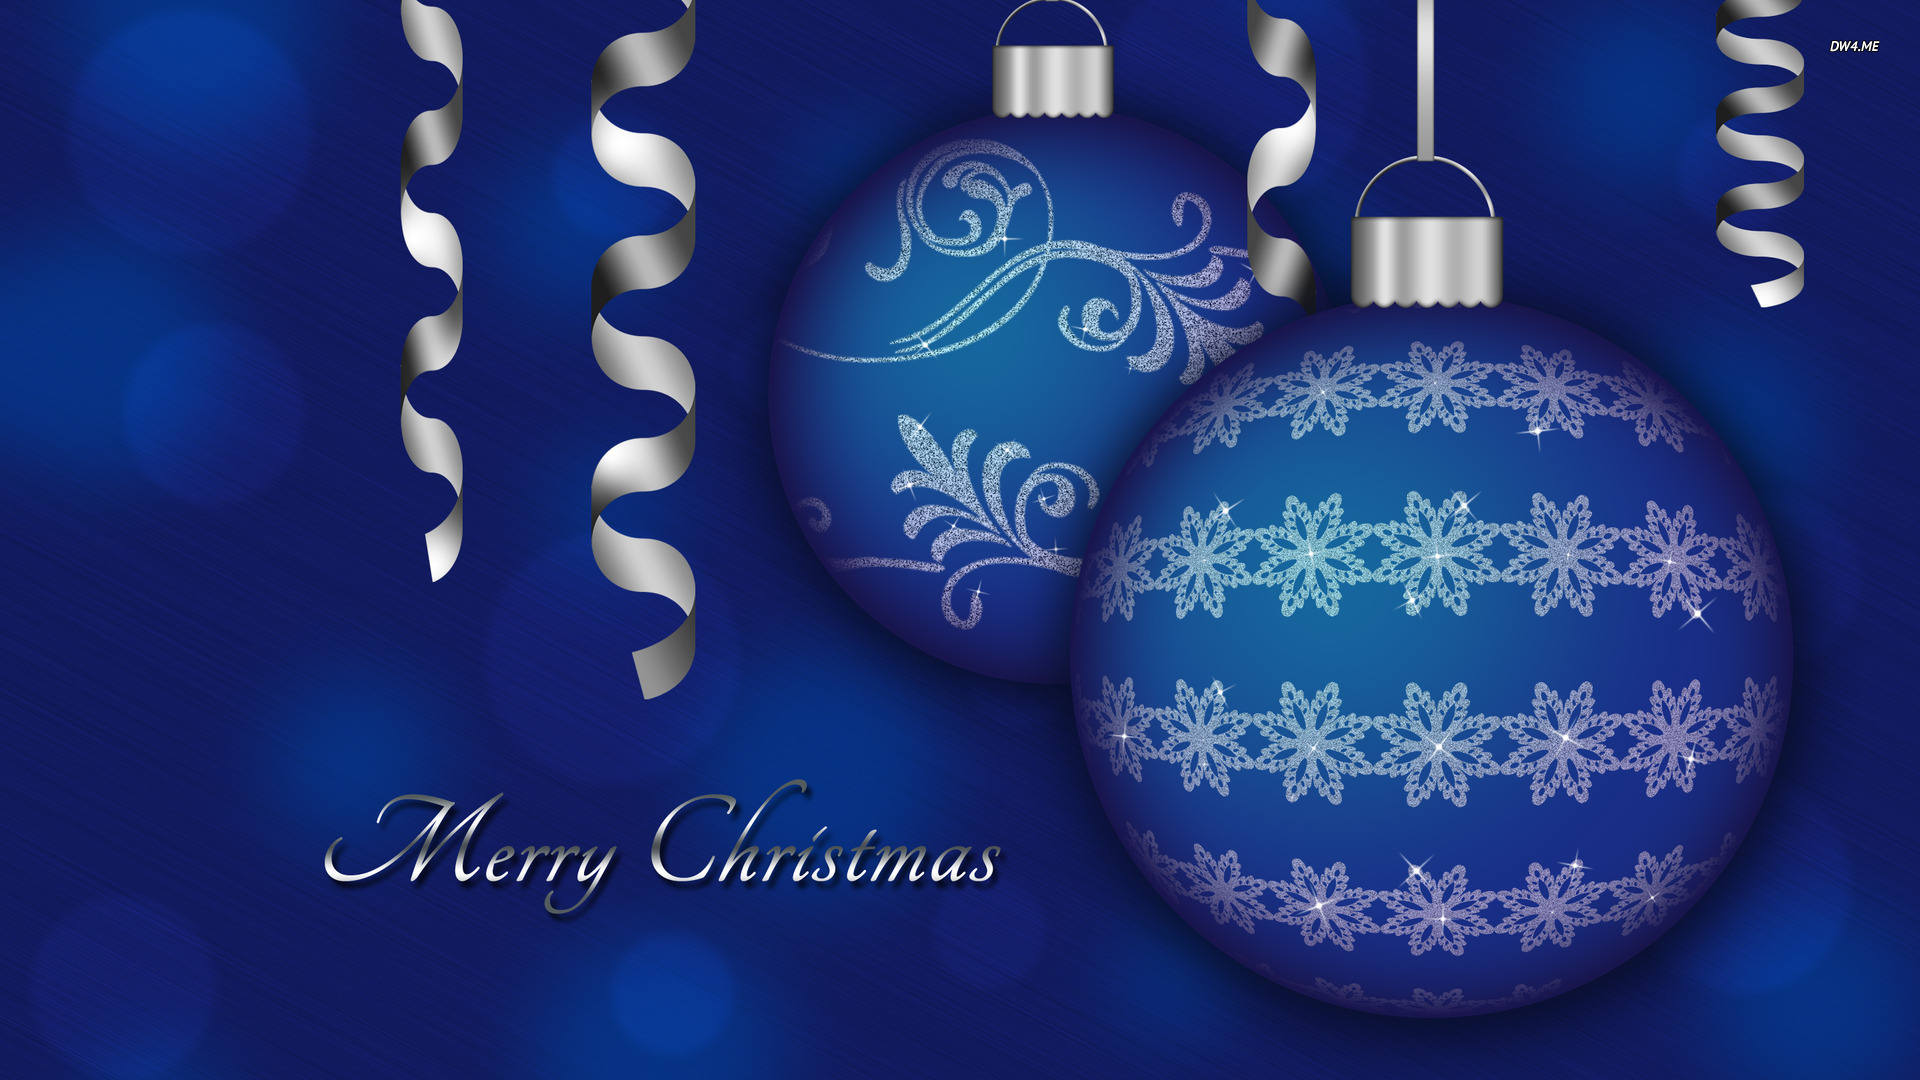 Ideas About Christmas Desktop Wallpaper On Pinterest - Merry Christmas Blue Ornaments - HD Wallpaper